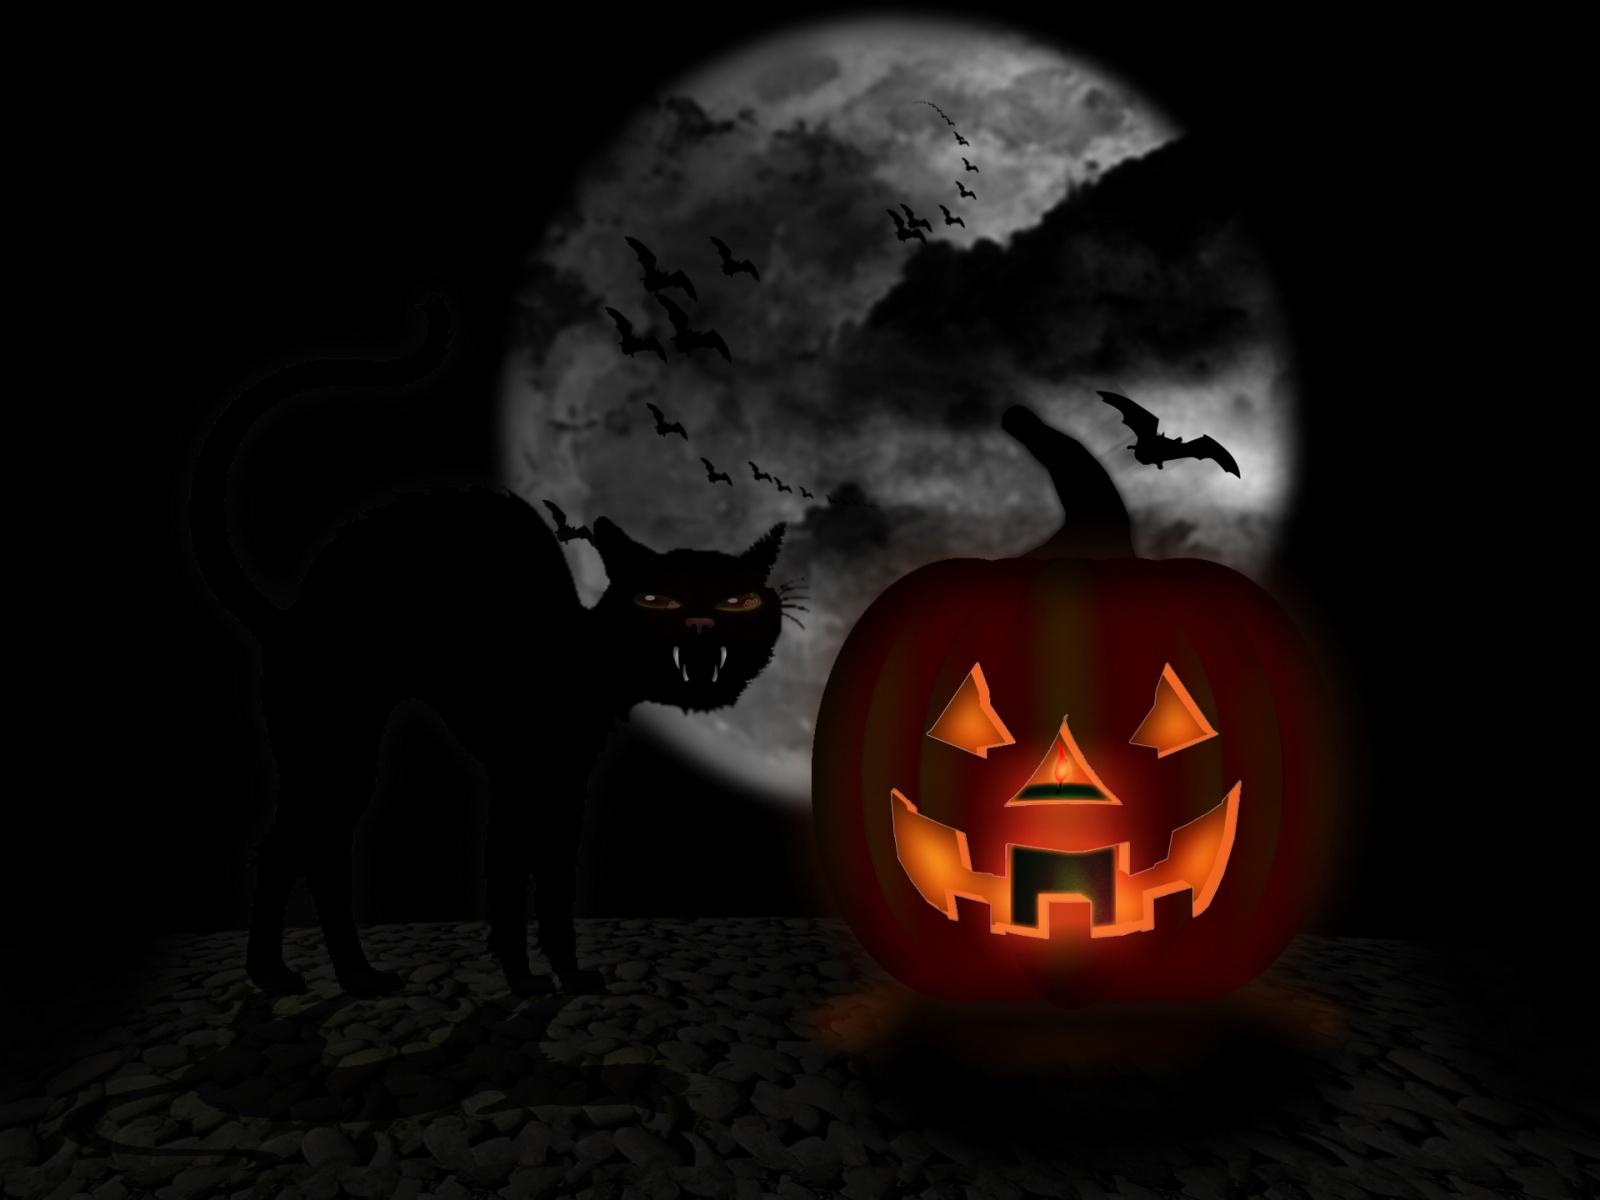 free halloween wallpaper 5208 1600x1200 px